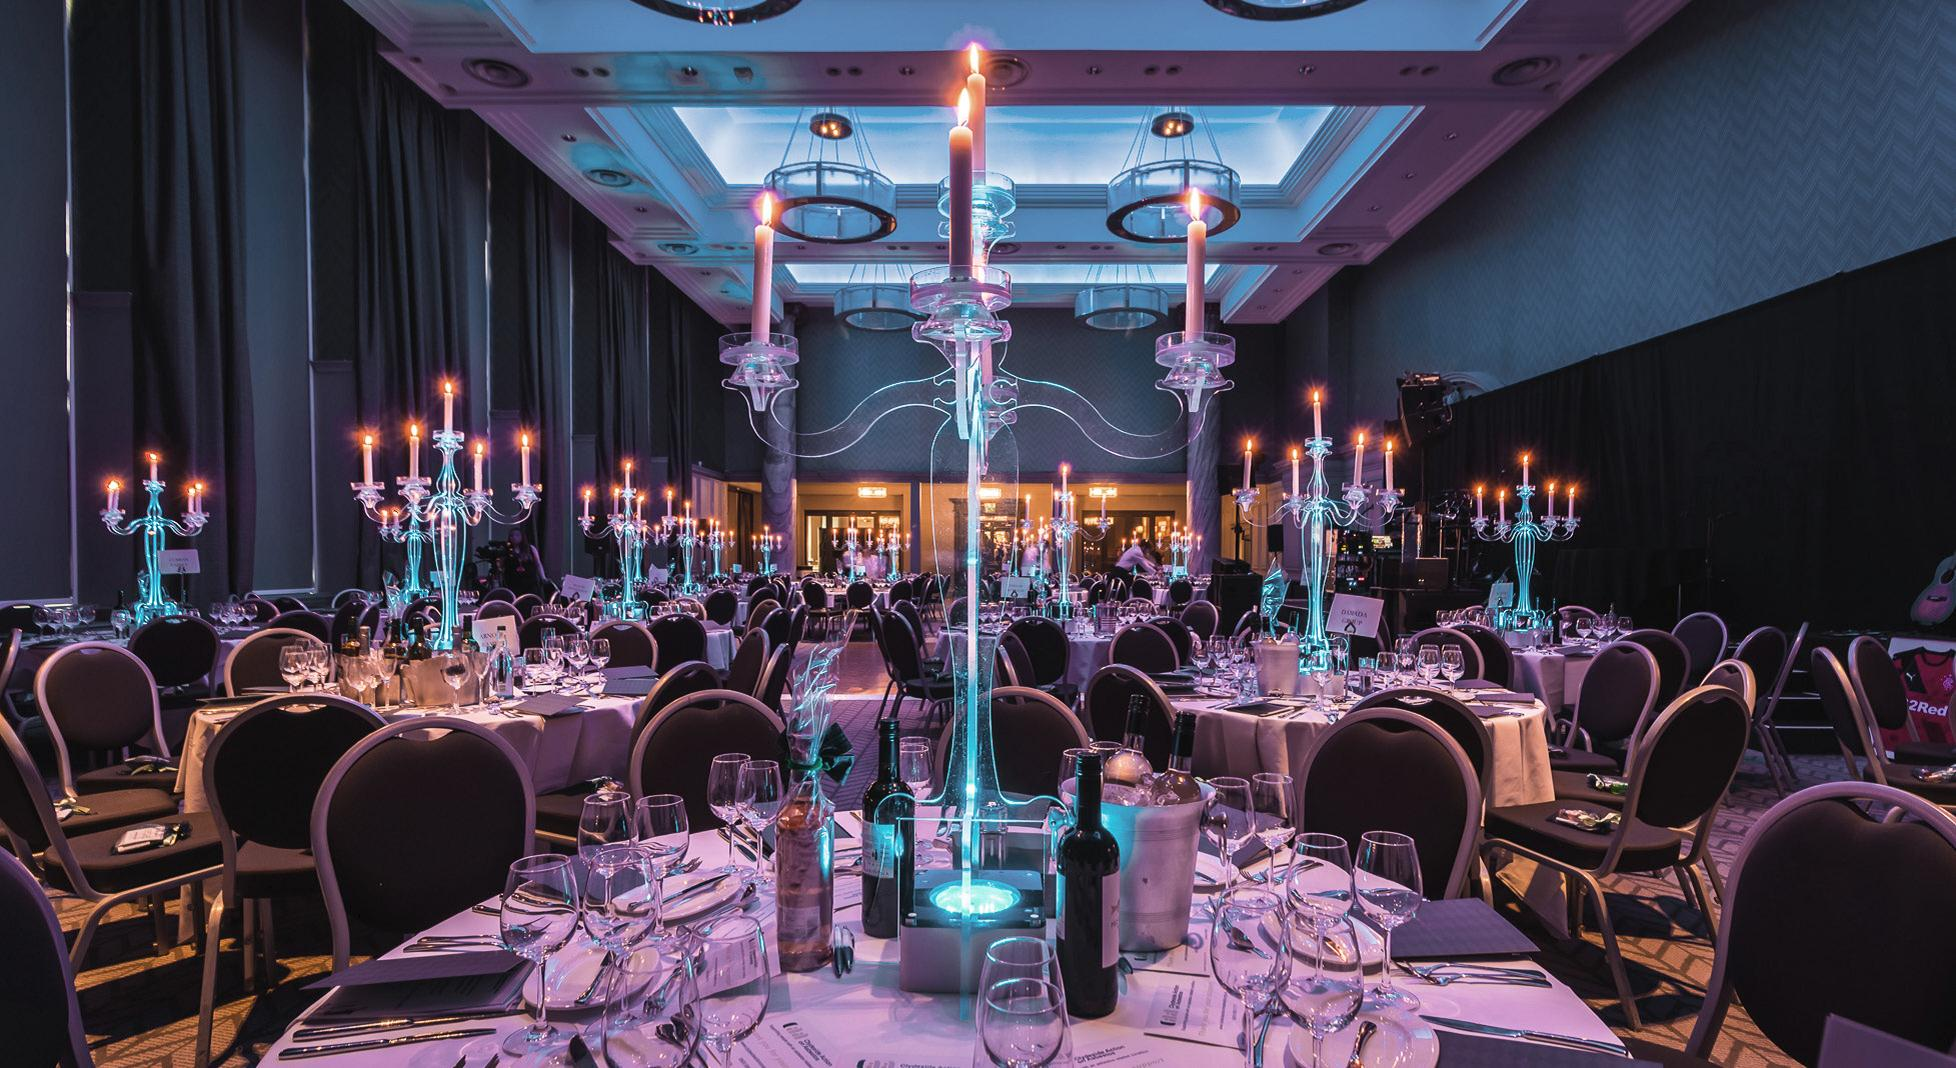 Conference Venue Details The Grand Central Hotel Glasgowglasgow